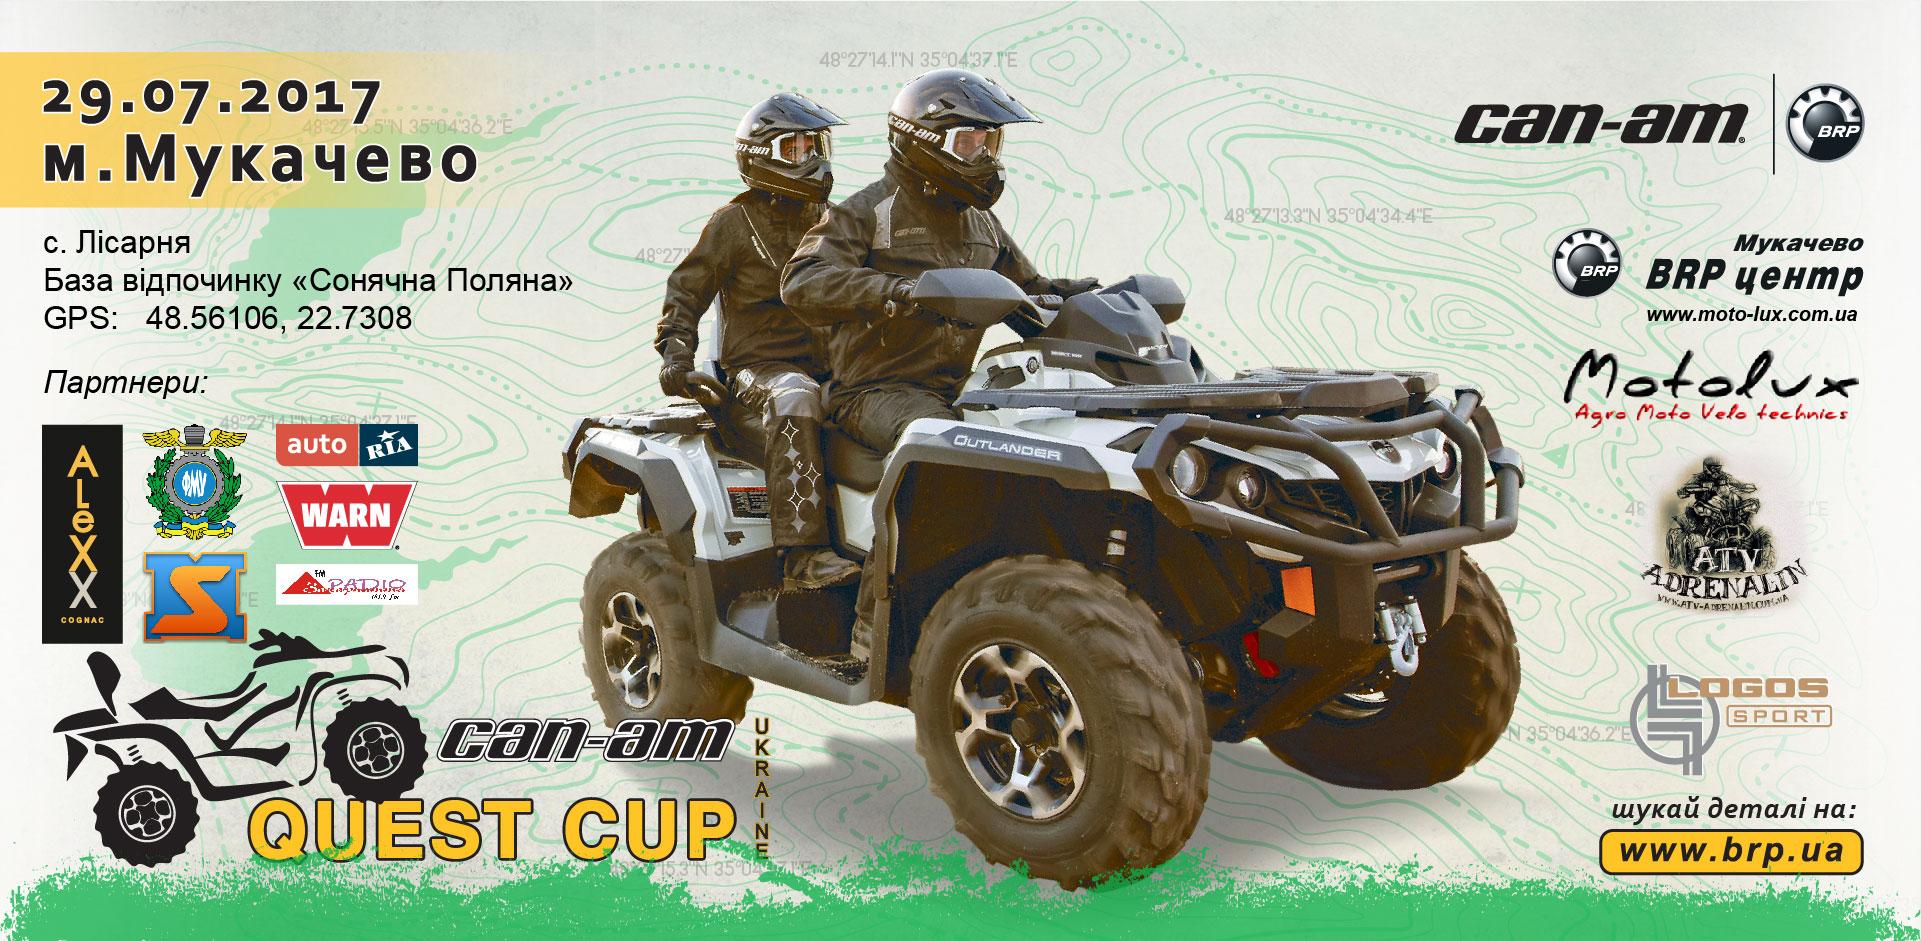 4-й  етап серії «CAN-AM QUEST CUP»! Мукачево.